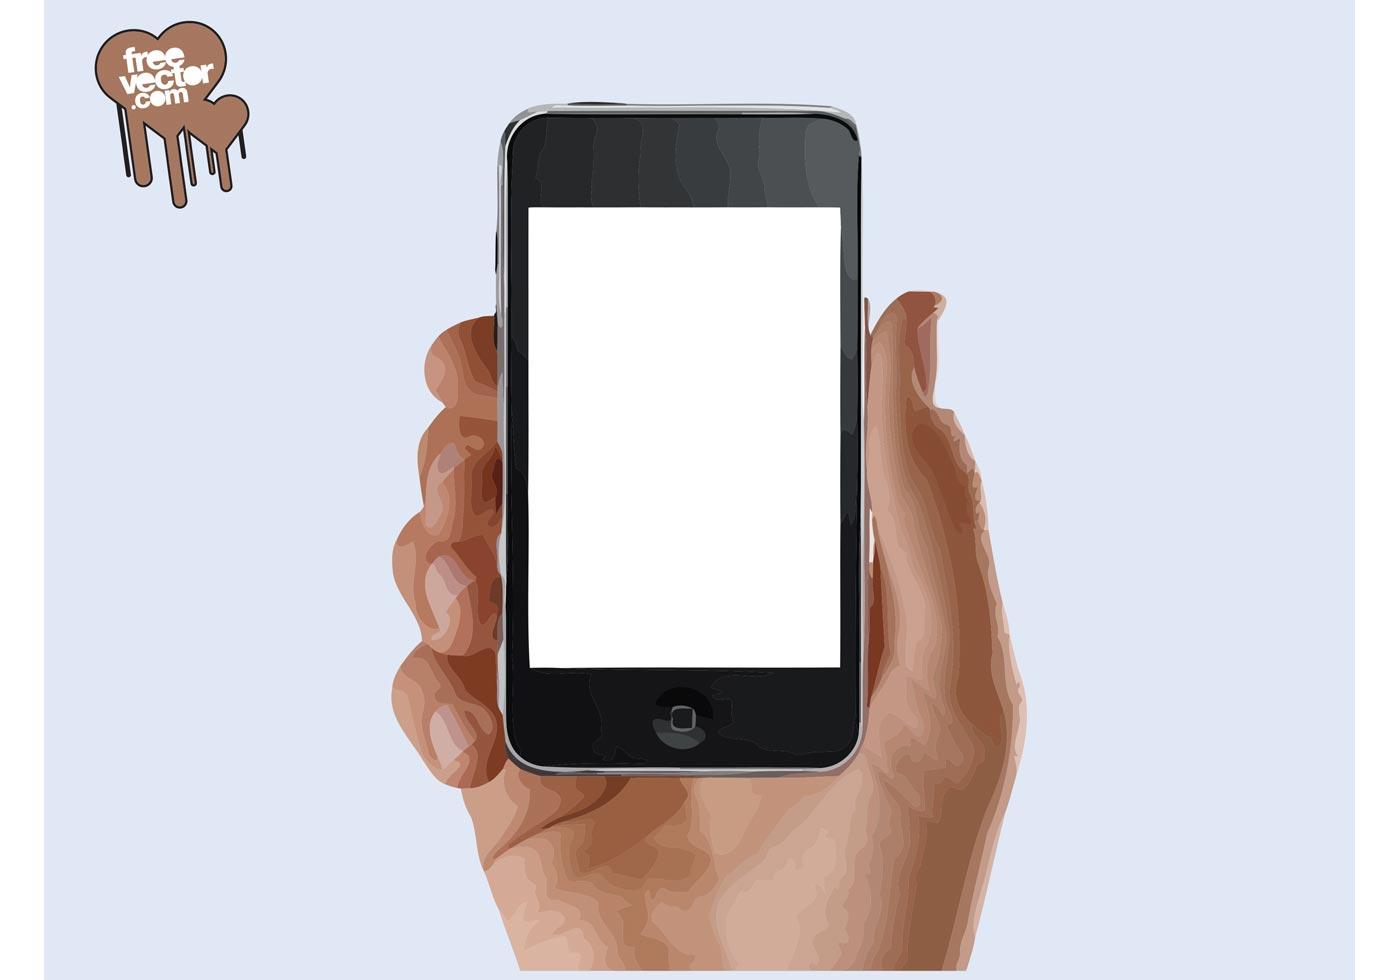 Iphone Stock Gratis